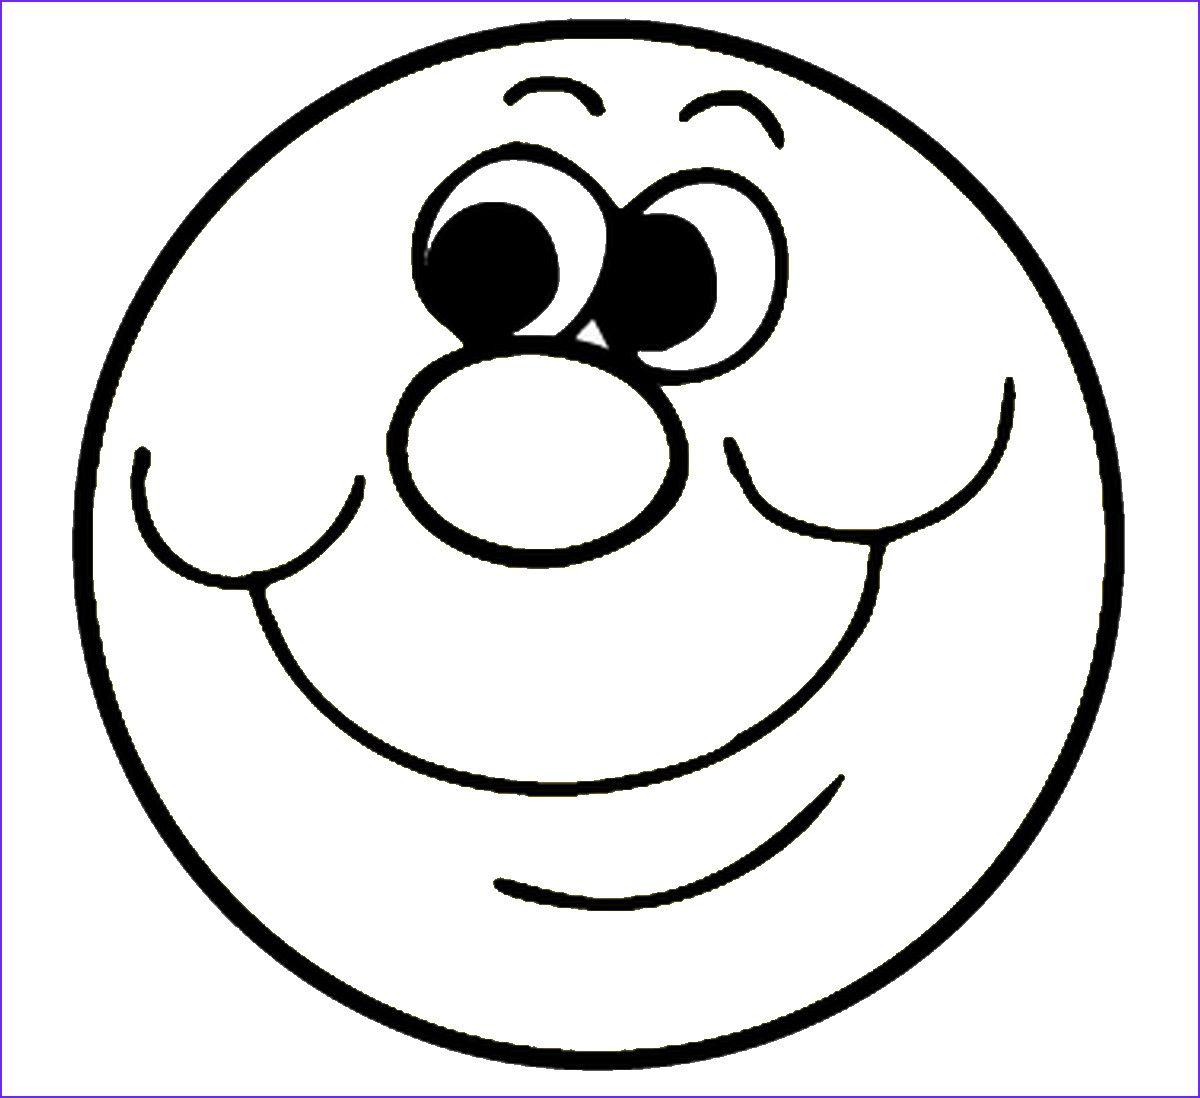 Emoji Coloring Pages Emoji Coloring Pages Love Coloring Pages Coloring Pages